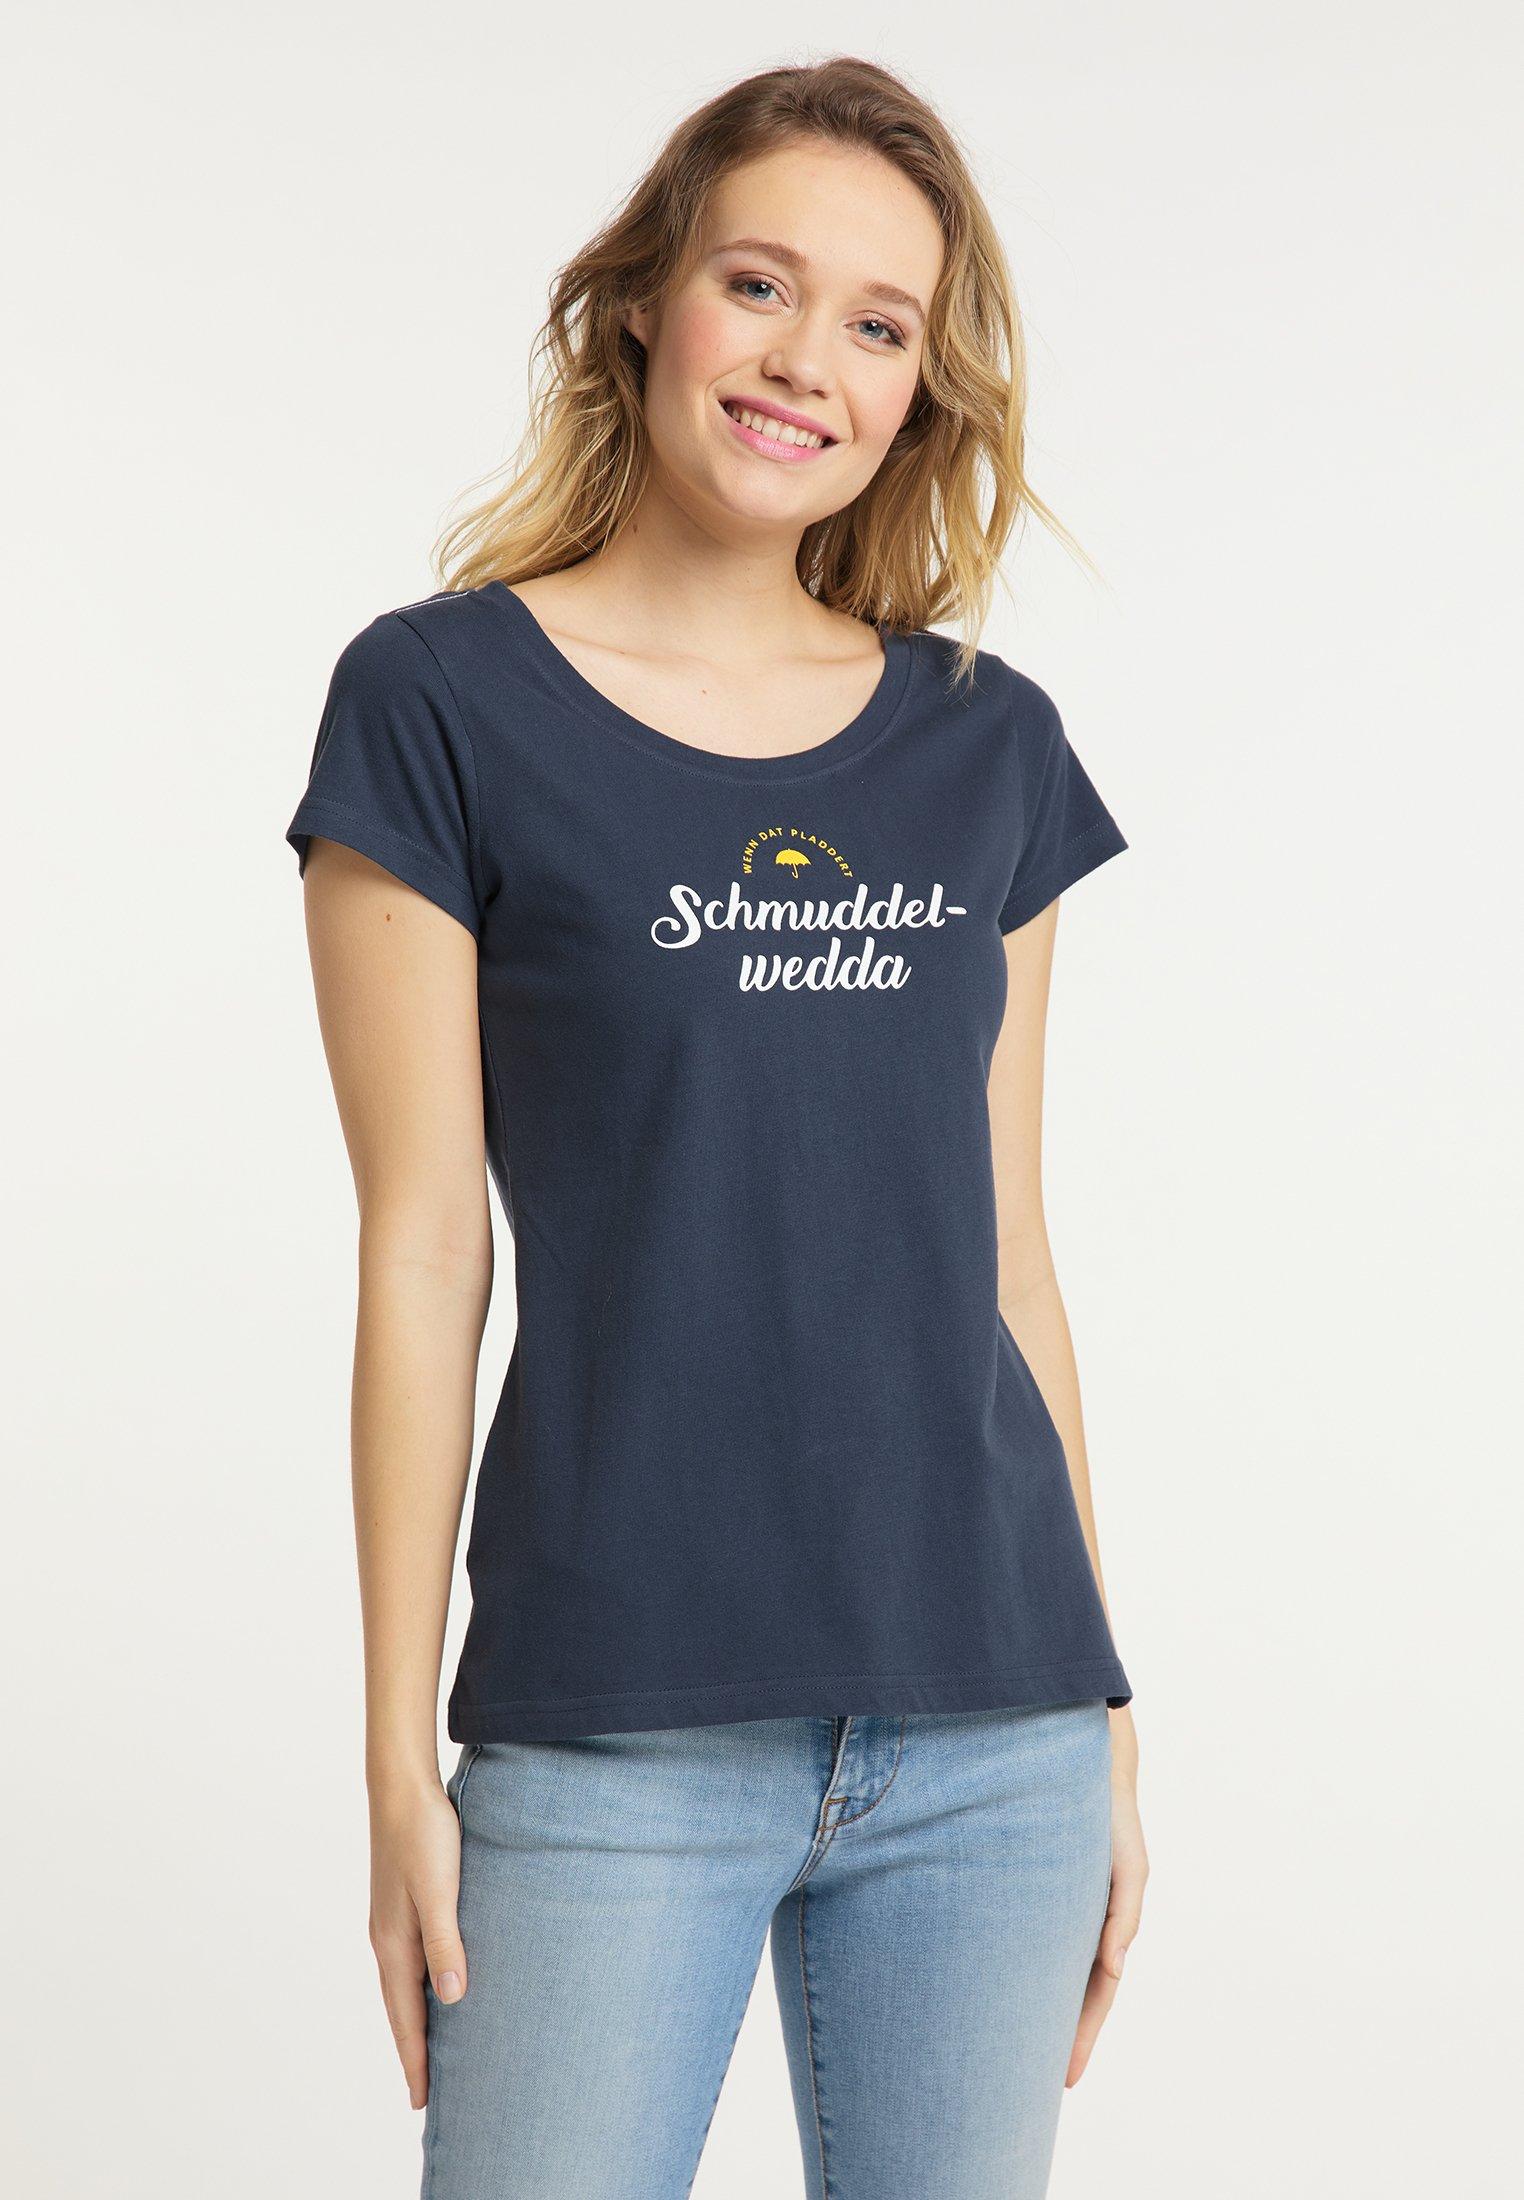 Schmuddelwedda T-shirt imprimé - marine - Tops & T-shirts Femme ak3g2